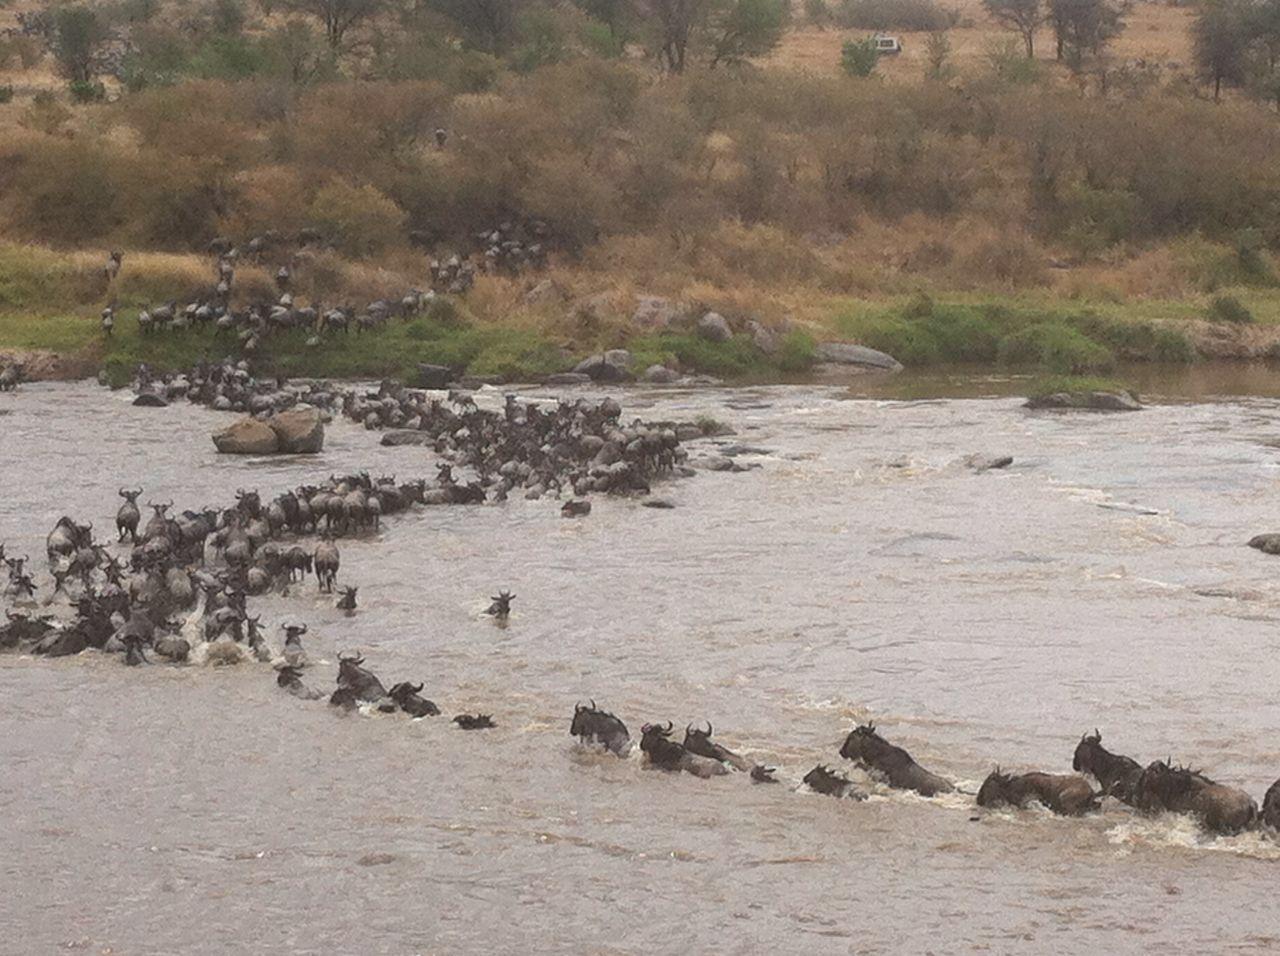 Serengeti Tour Companies